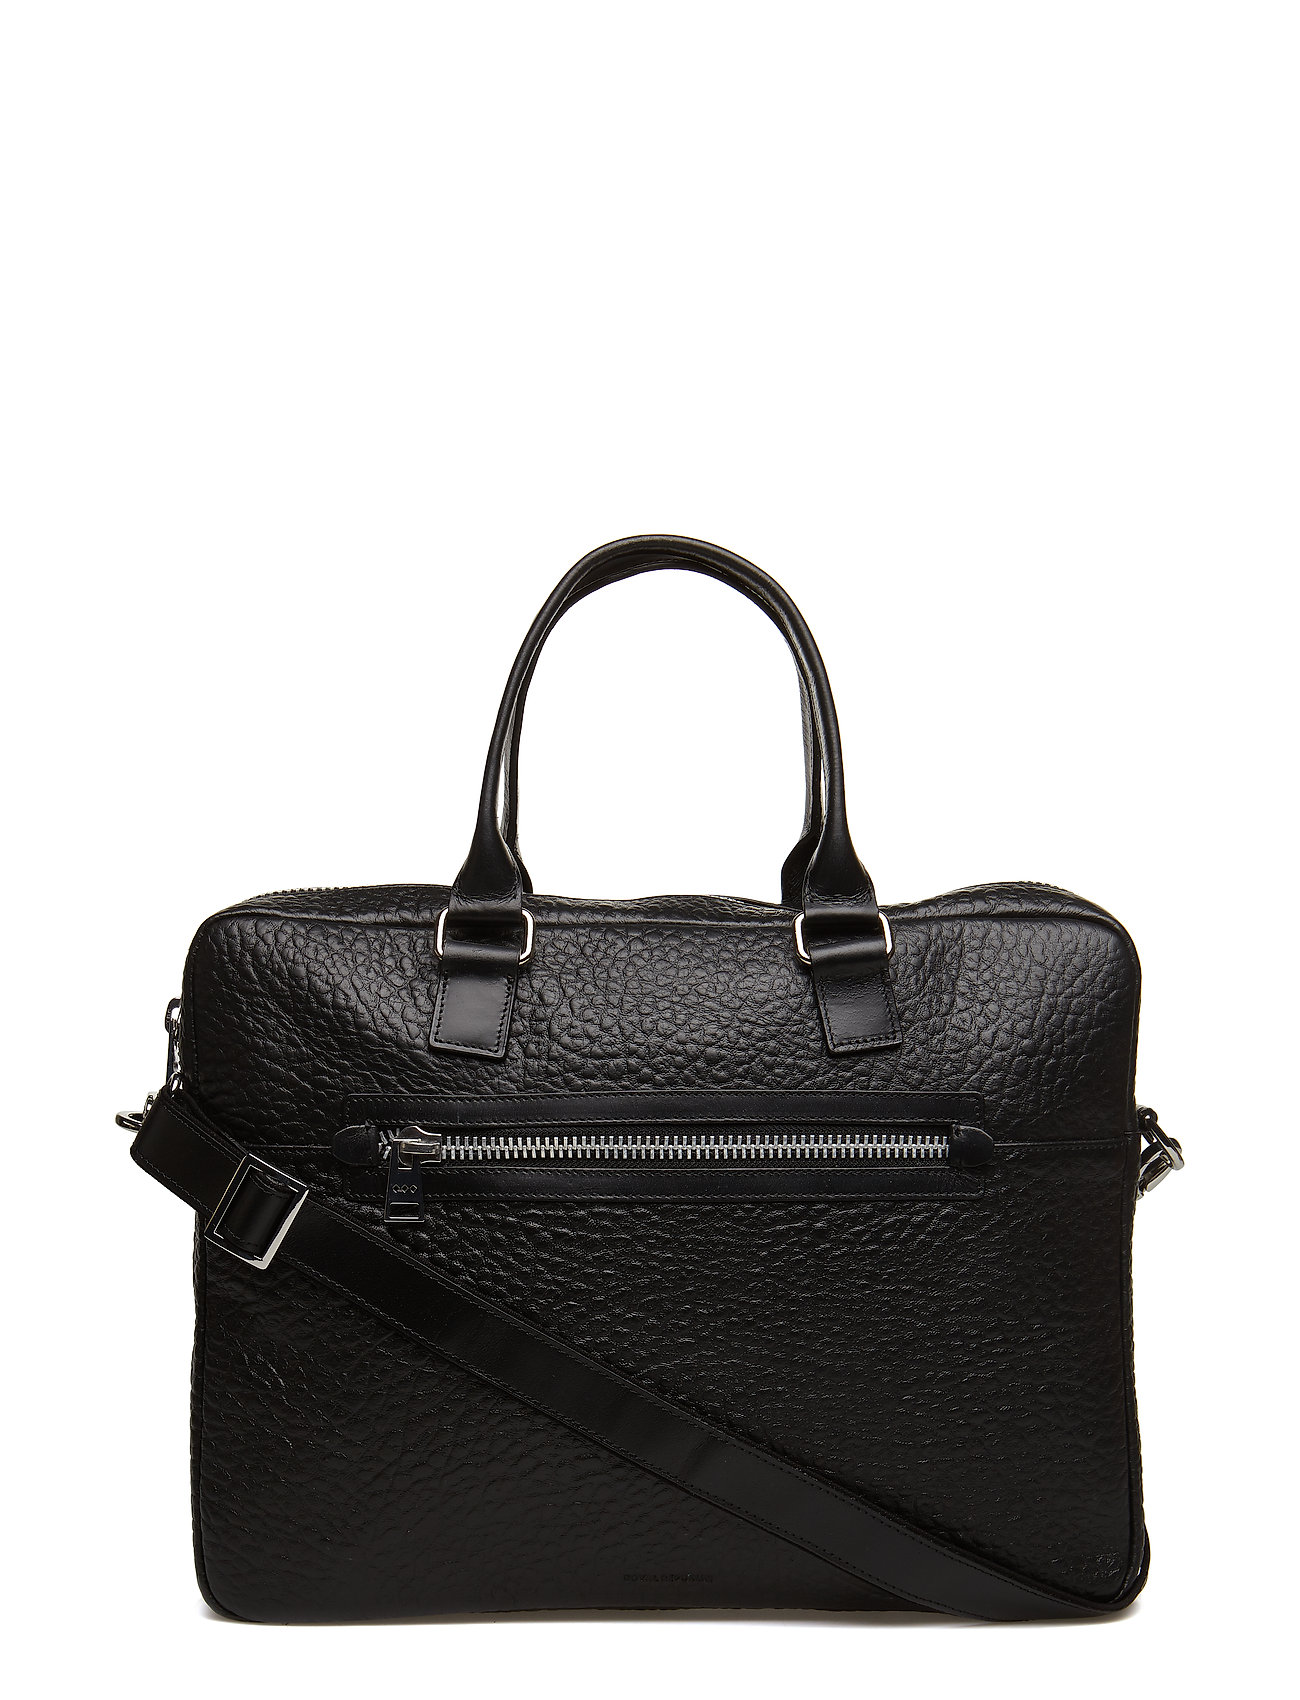 Royal RepubliQ Tenacity Day Bag